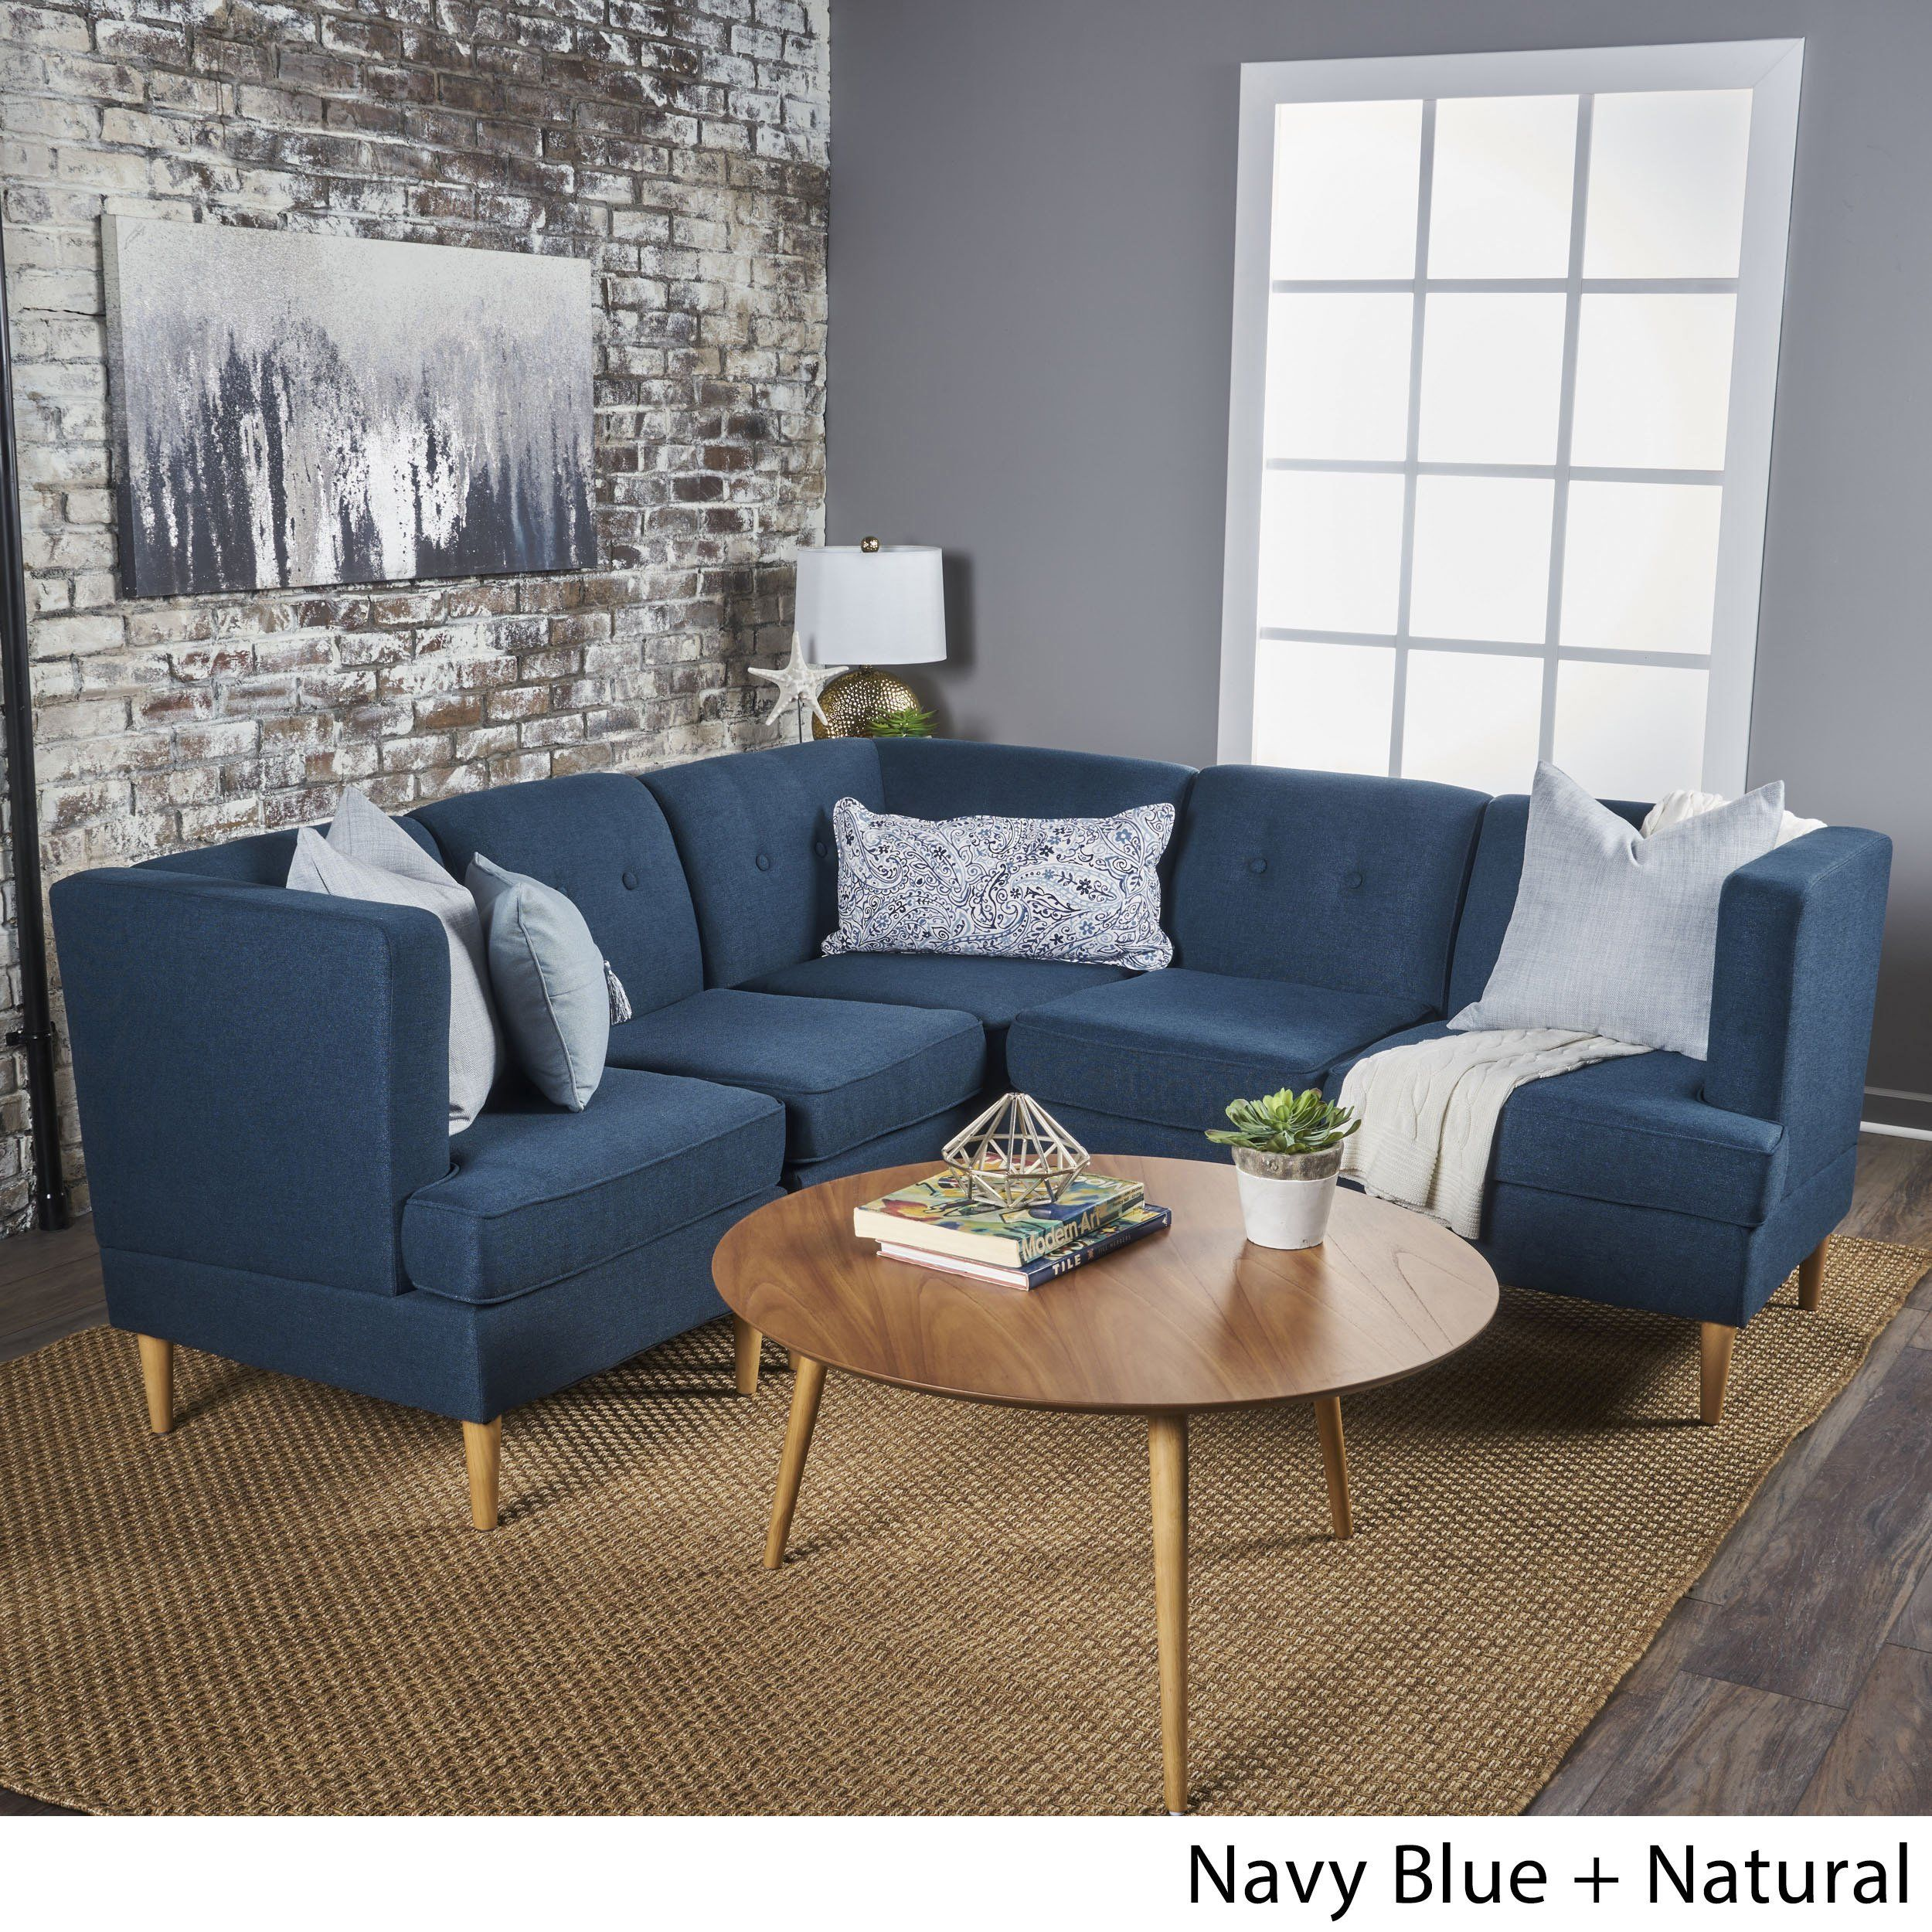 Surprising Carson Carrington Larvik Mid Century Modern 5 Piece Fabric Unemploymentrelief Wooden Chair Designs For Living Room Unemploymentrelieforg